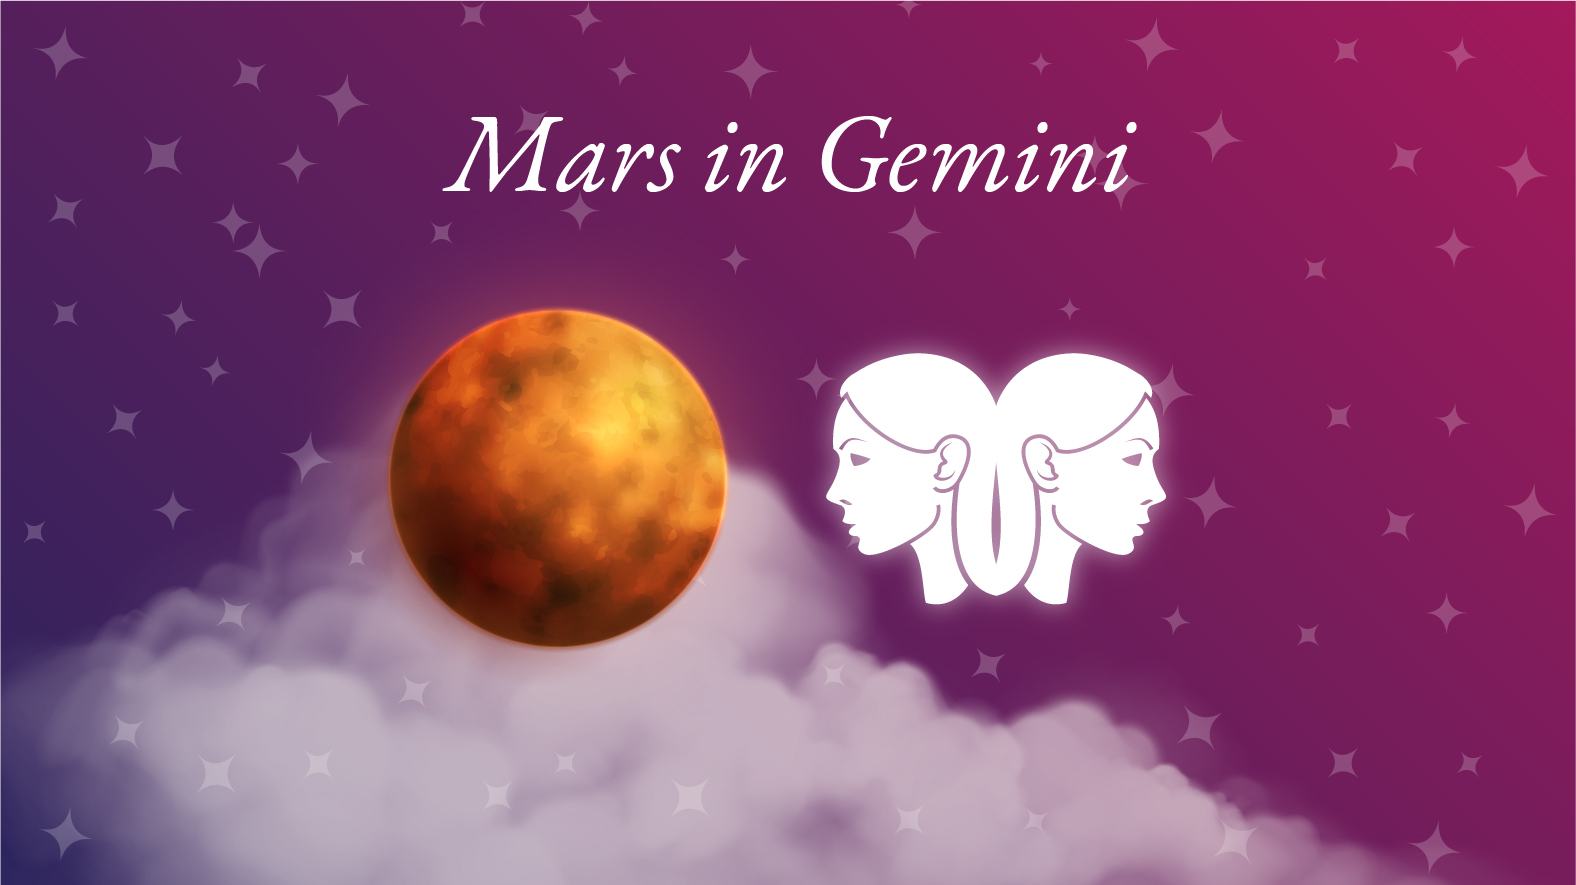 Mars in Gemini Meaning